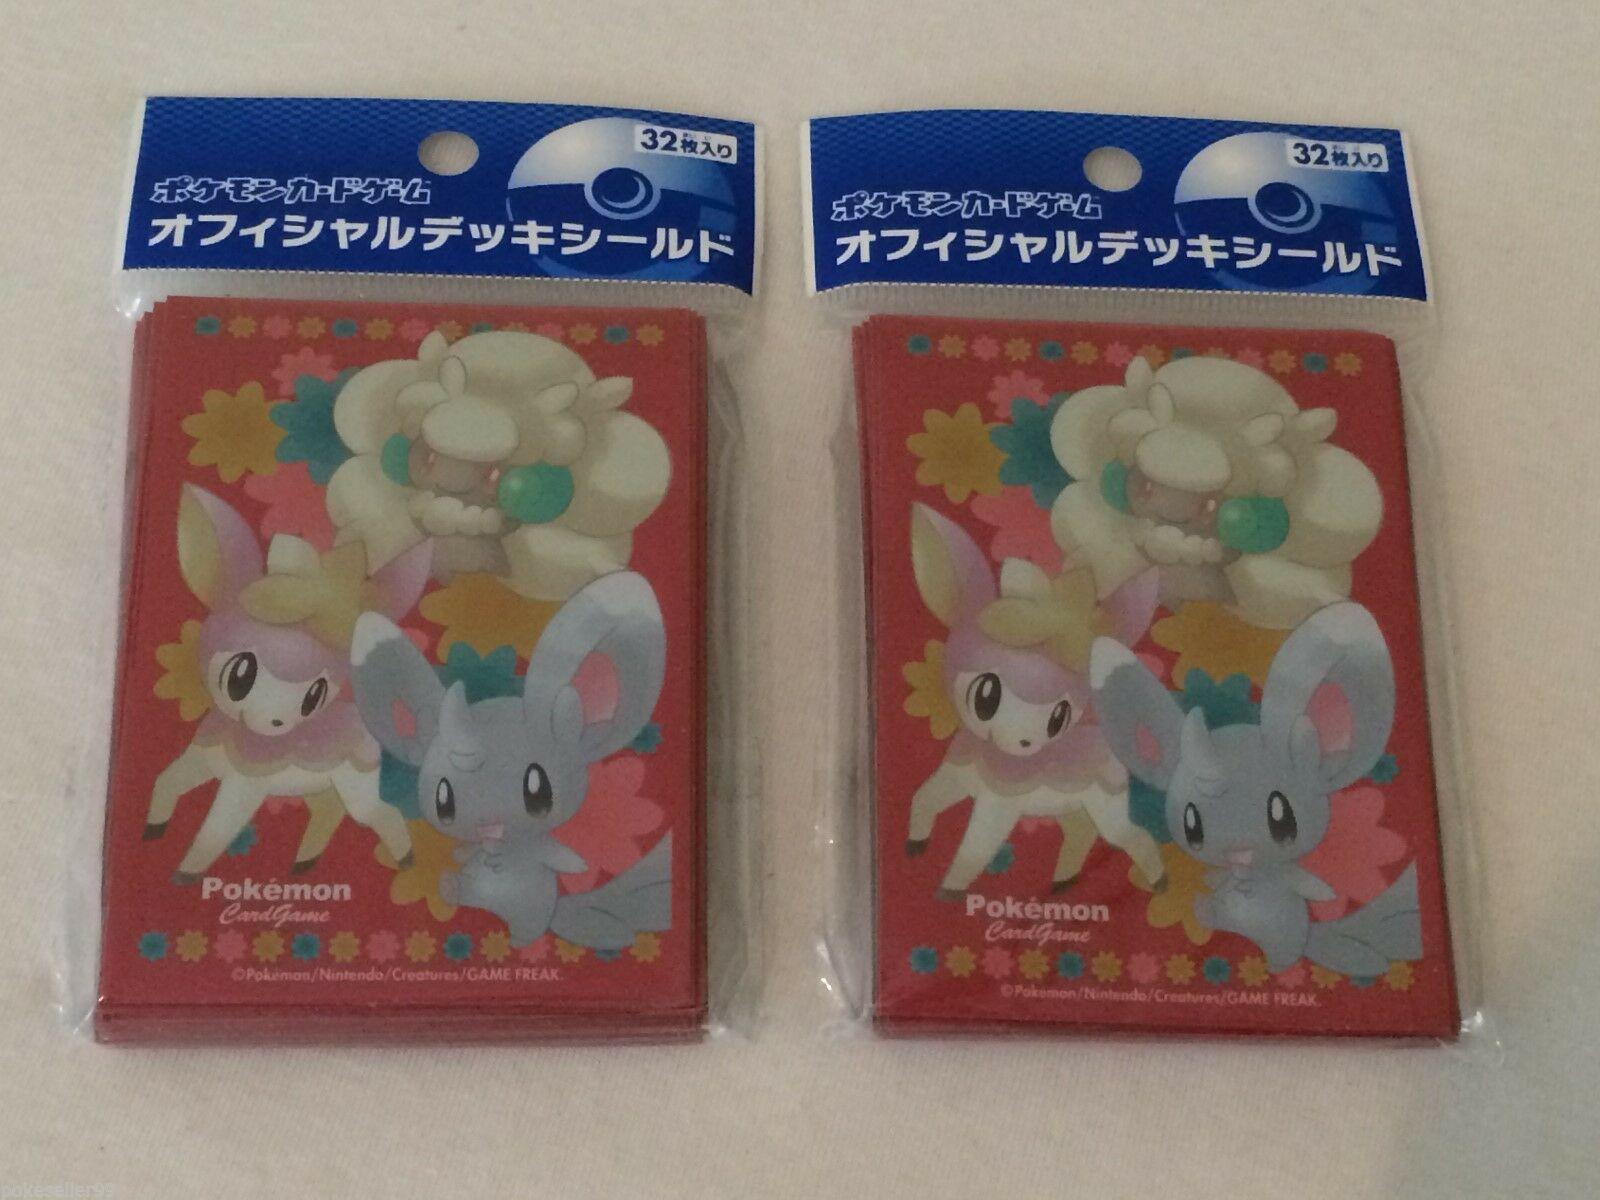 Japanese Pokemon center Fairy Ninetales Whimsicott Togepi Clefairy Deck Case Box